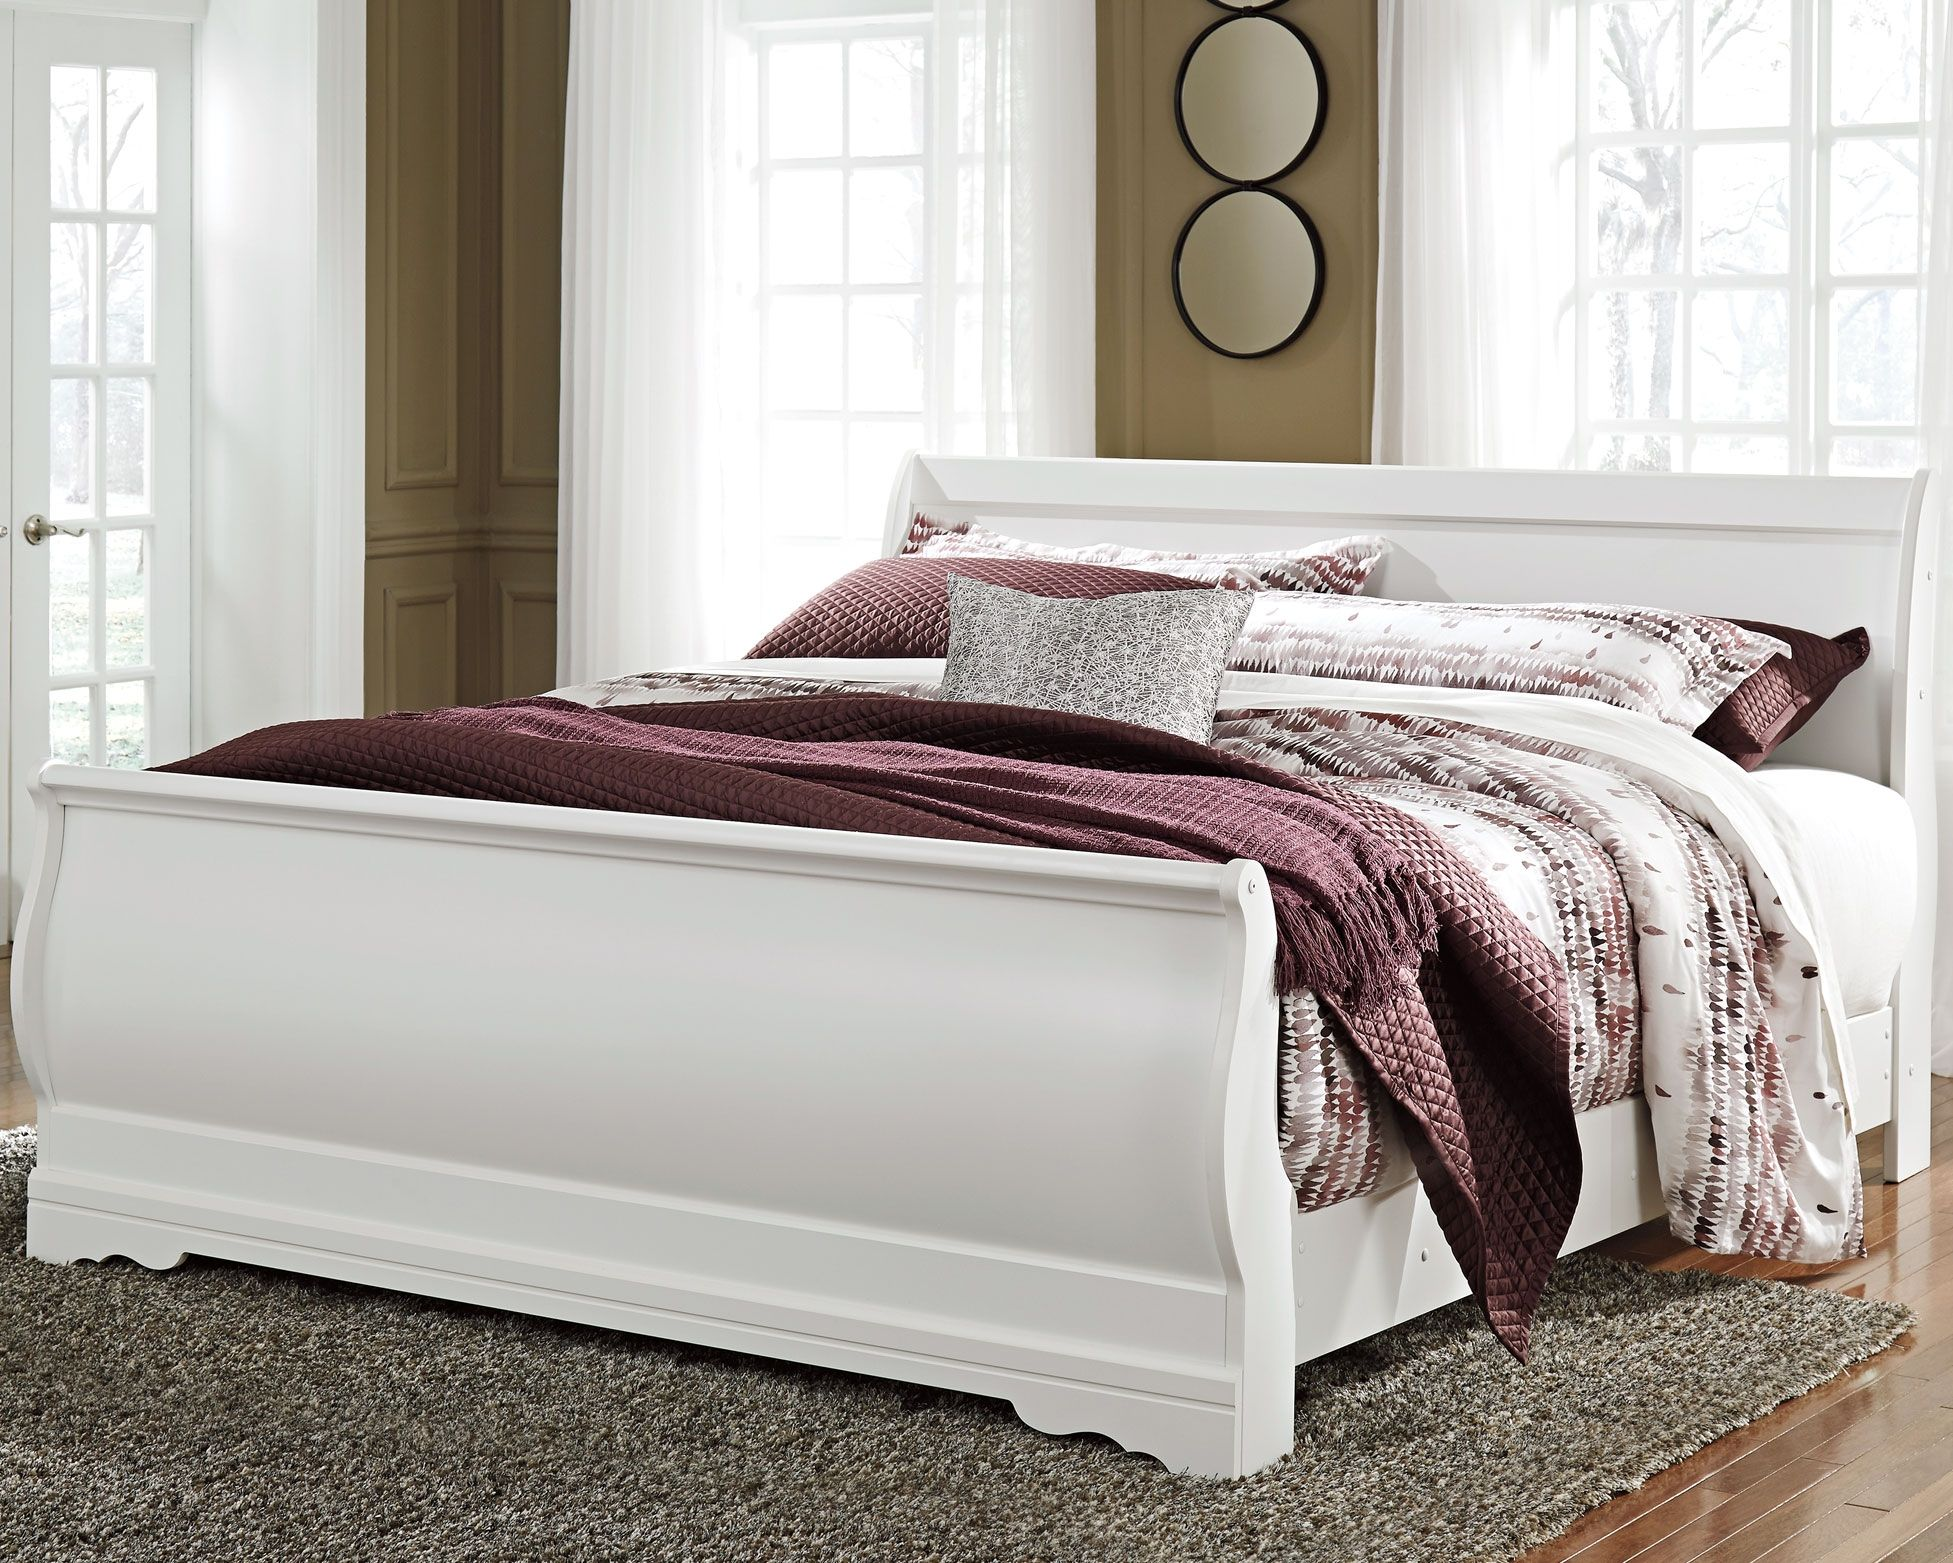 Ashley Anarasia 4PC Queen Sleigh Headboard Bedroom Set In